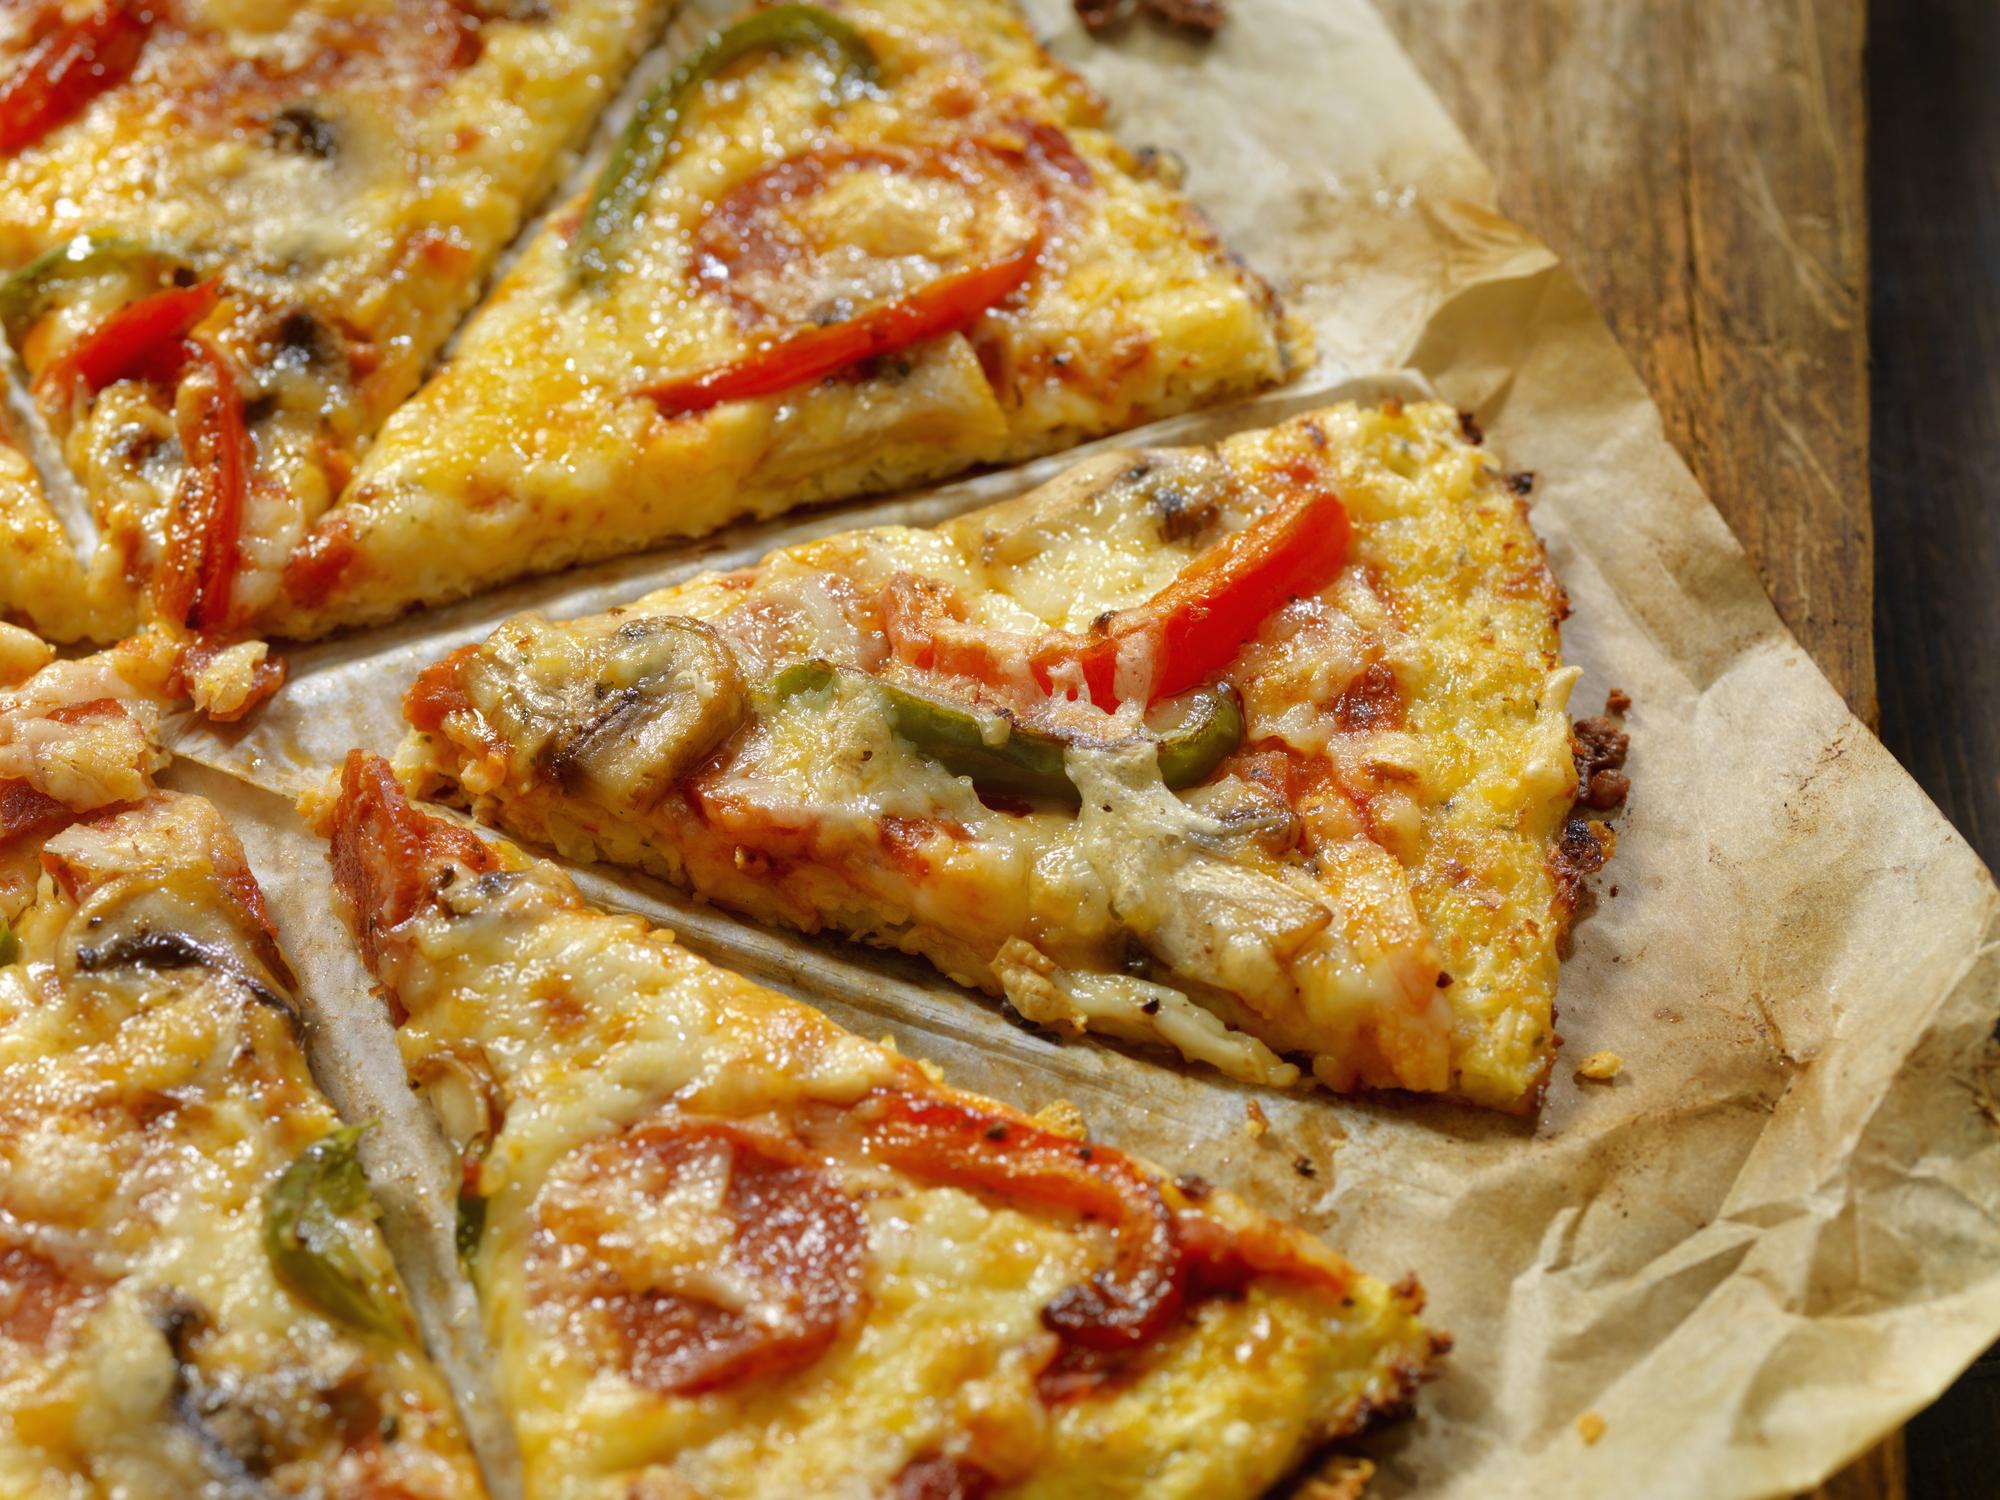 California Pizza Kitchen Cauliflower Crust Nutrition Facts ...